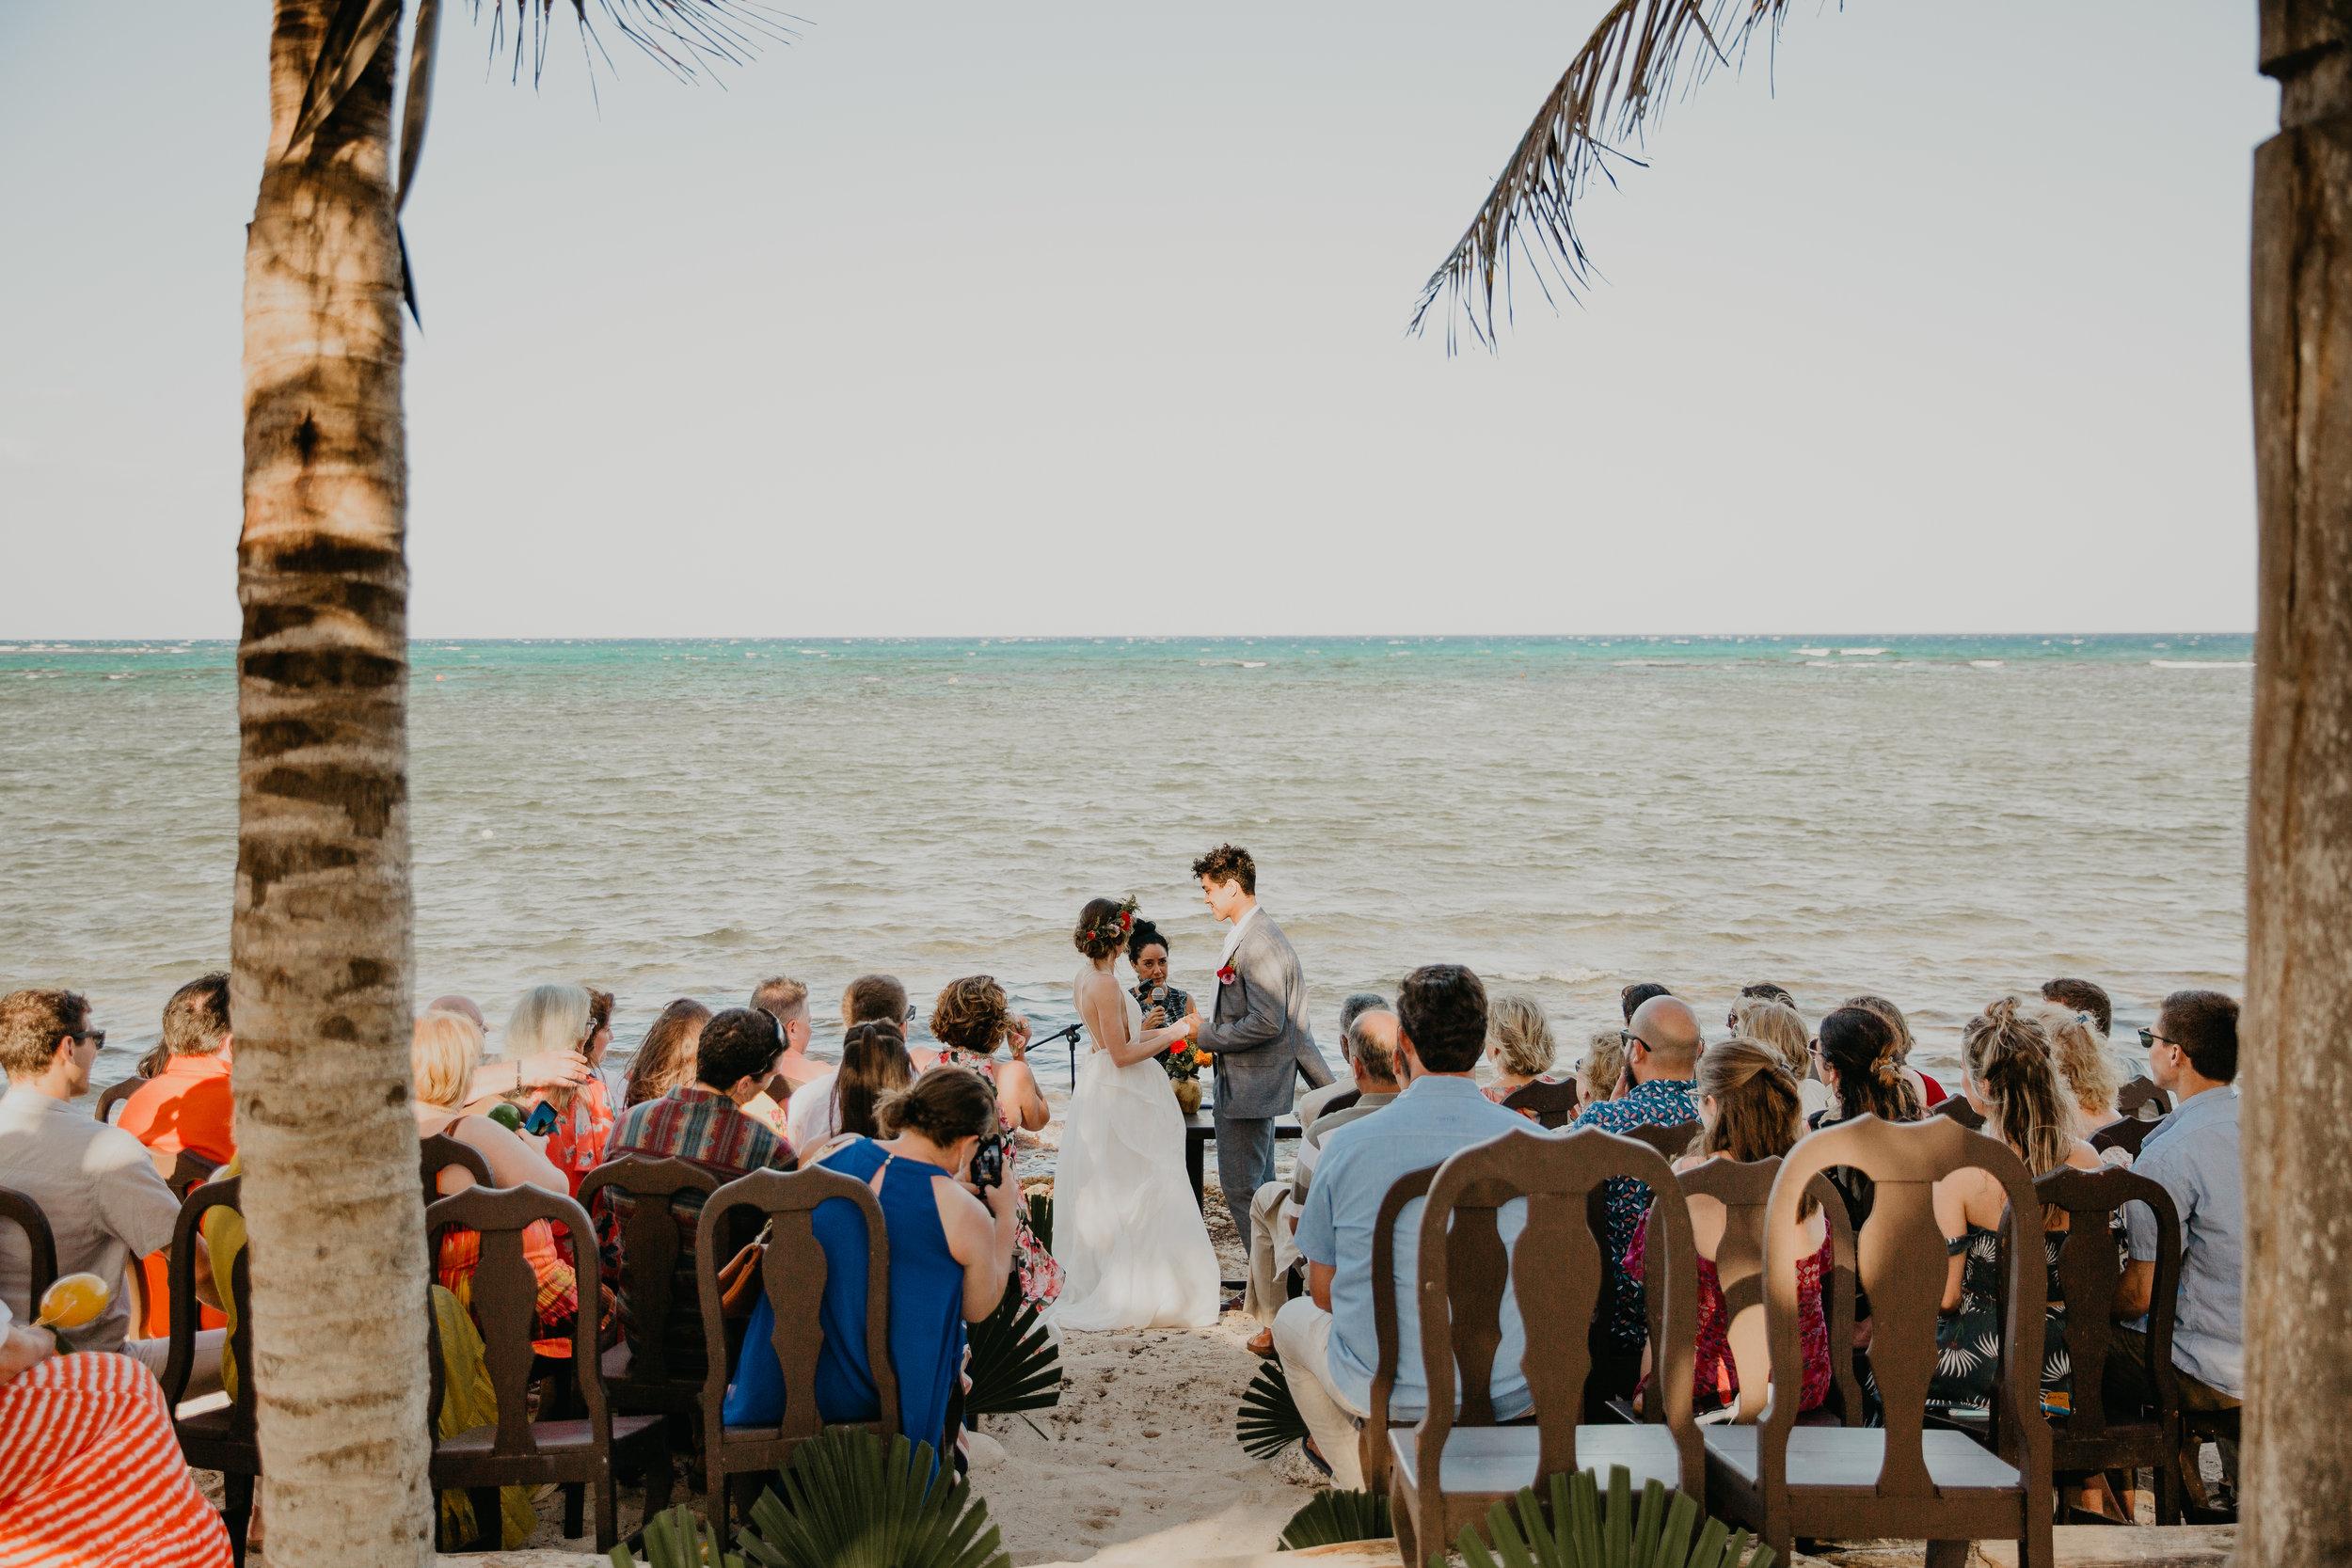 Nicole-Daacke-Photography-beachfront-akumal-destionation-wedding-tulum-mexico-elopement-photographer-destination-wedding-inspiration-sunset-champagne-pop-boho-bride-ocean-tropical-bohemian-tulum-wedding-photos-167.jpg